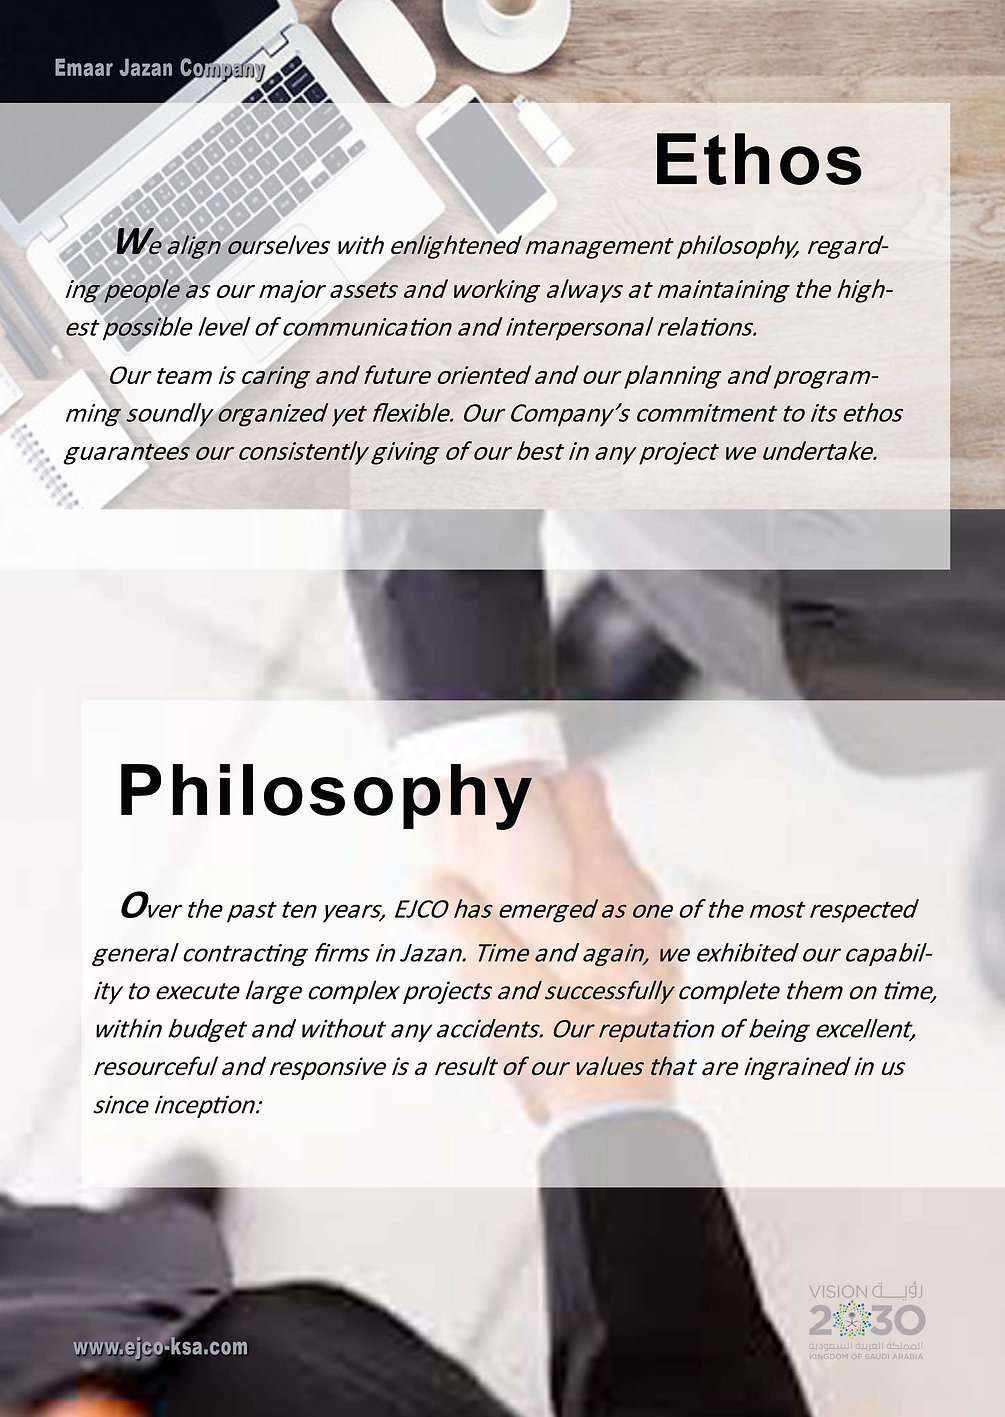 Ethos and Philosophy.jpg